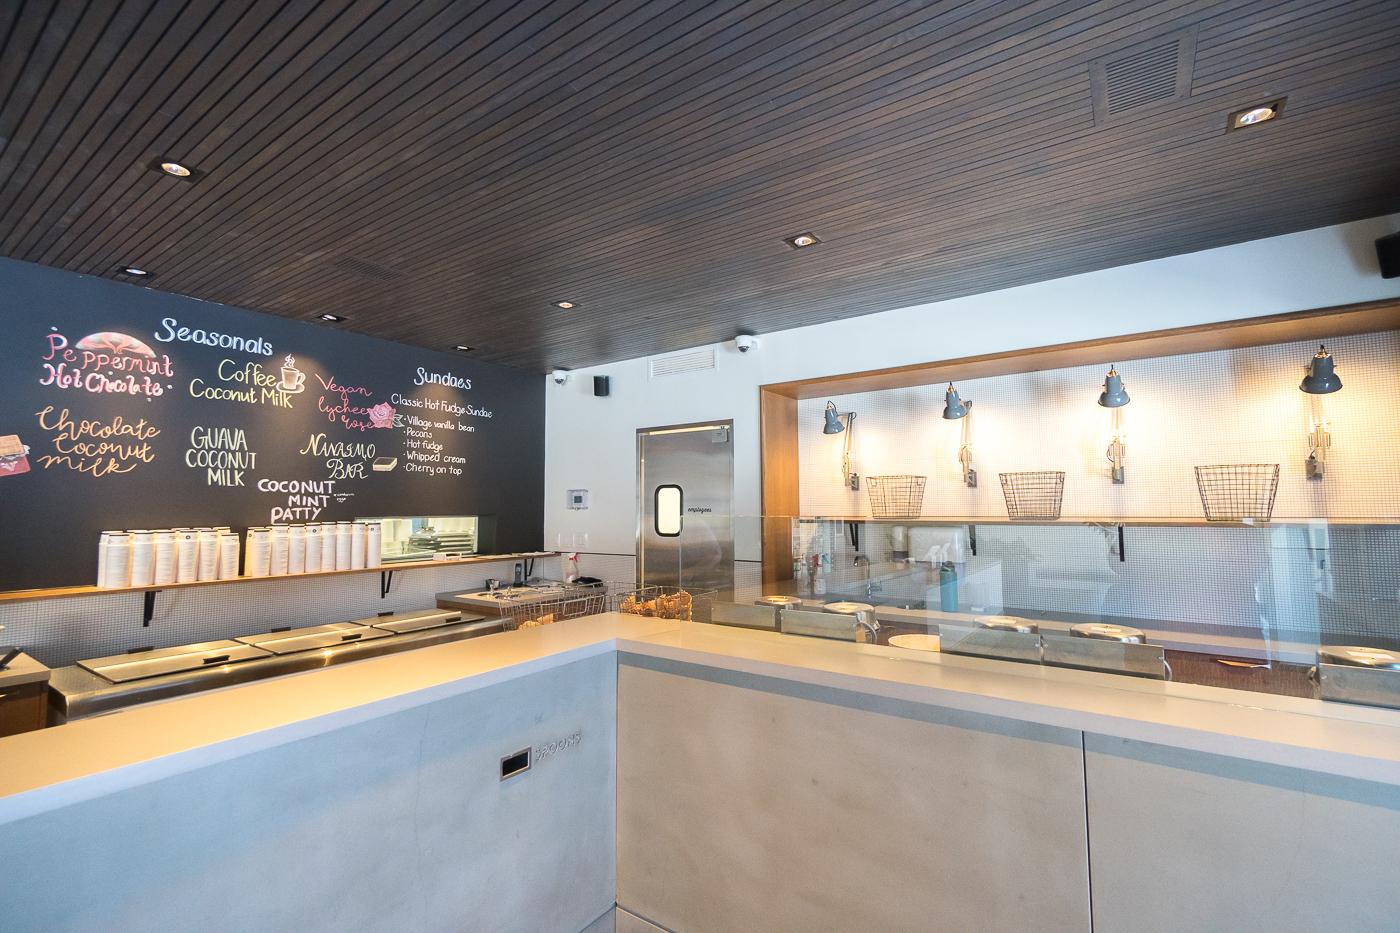 Intérieur du Village Ice Cream - Quoi manger à Calgary, Alberta